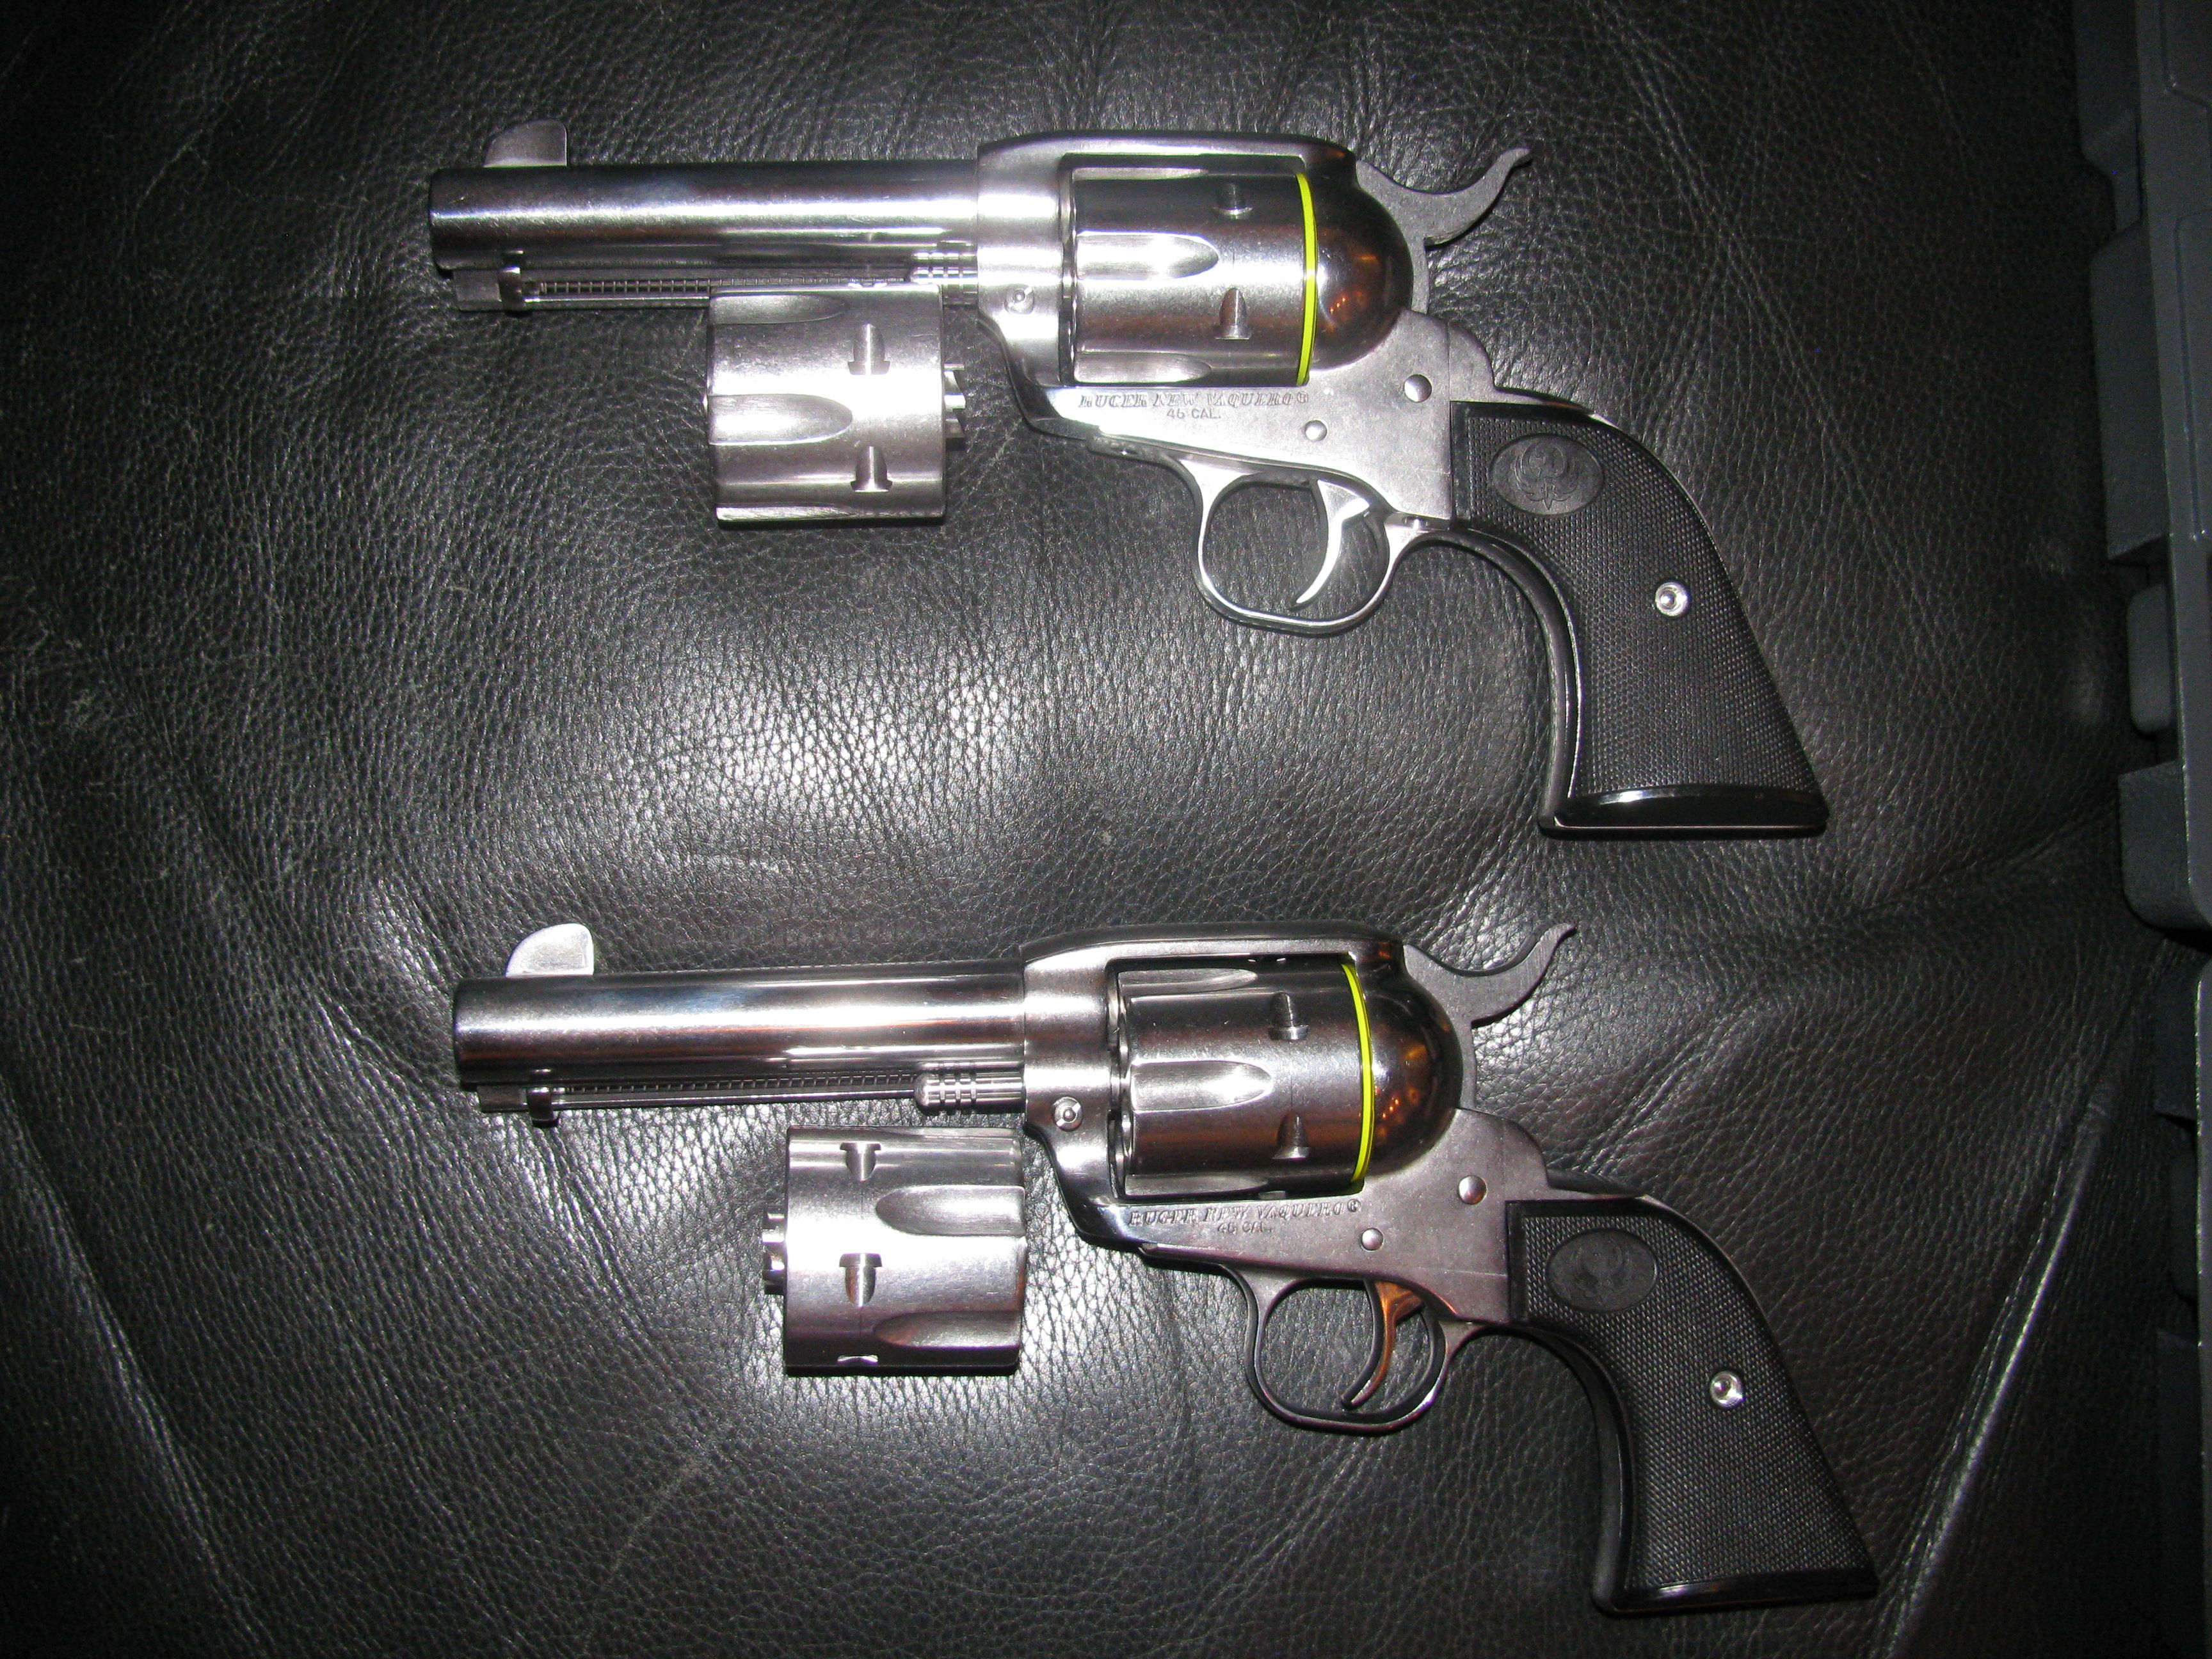 Cowboy revolver - Revolver Handguns